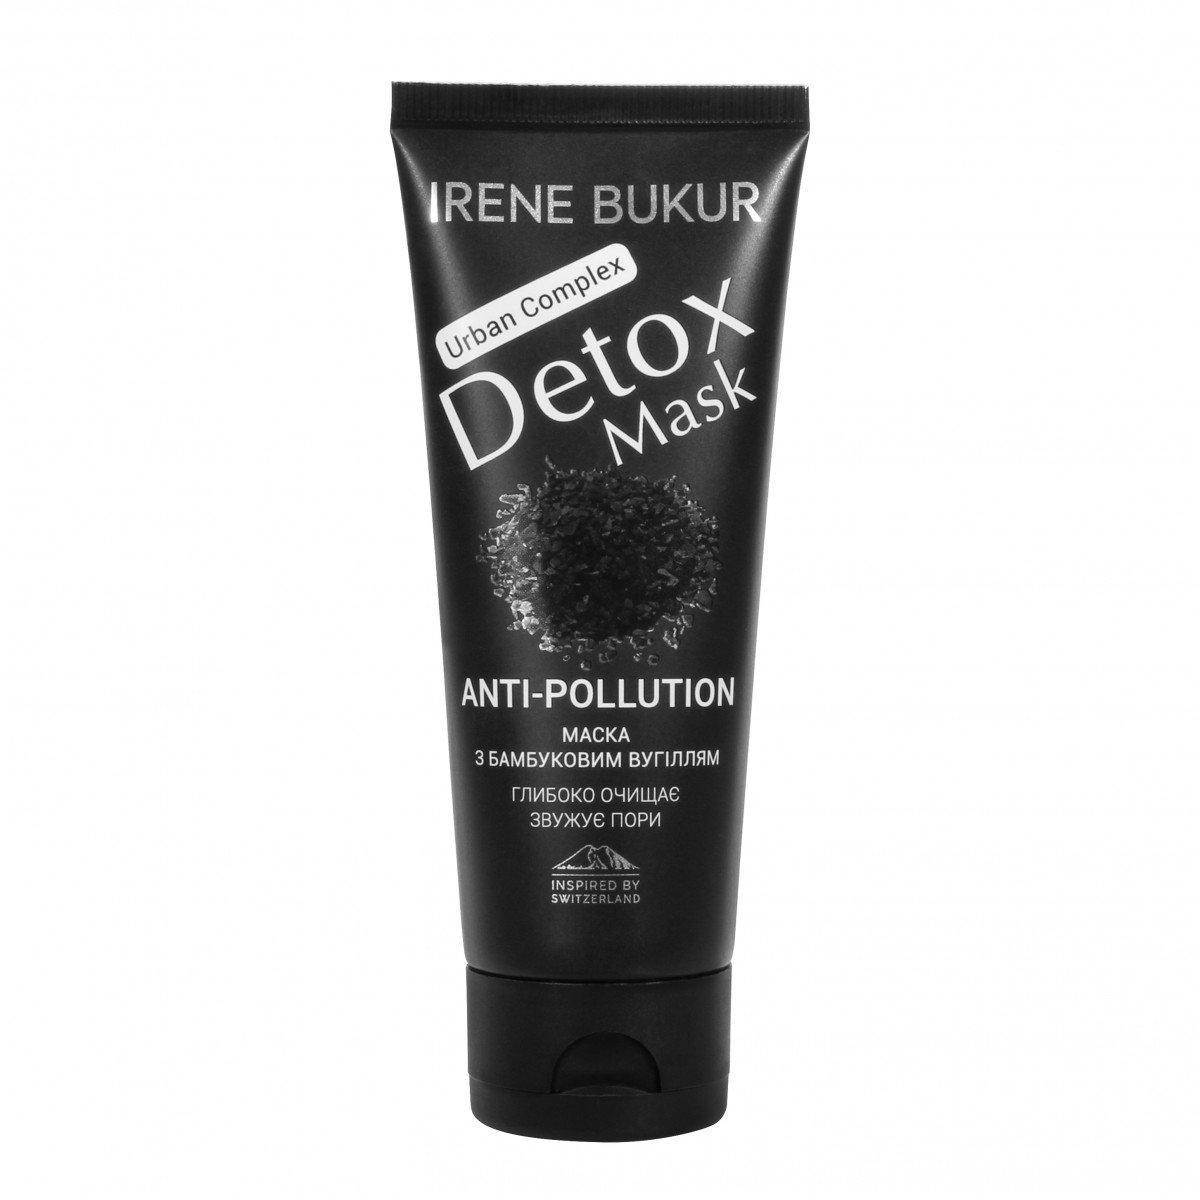 "Detox-маска для обличчя ""Anti-pollution"" з бамбуковим вугіллям, 75 мл"